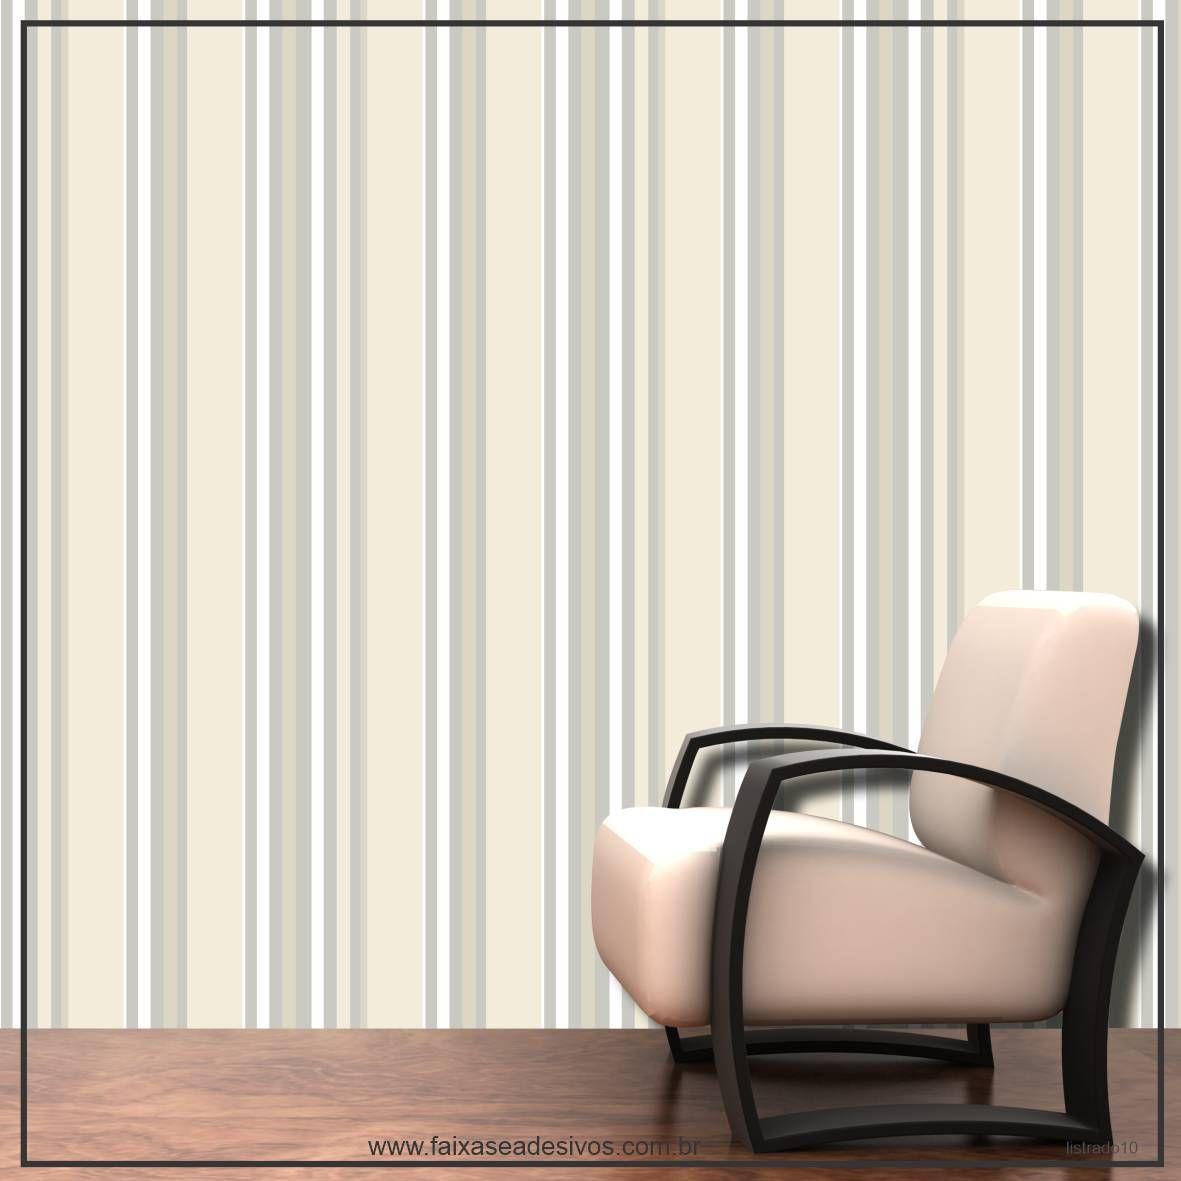 020 - Adesivo Decorativo de parede Listras pastel e cinza - 58cm larg  - Fac Signs